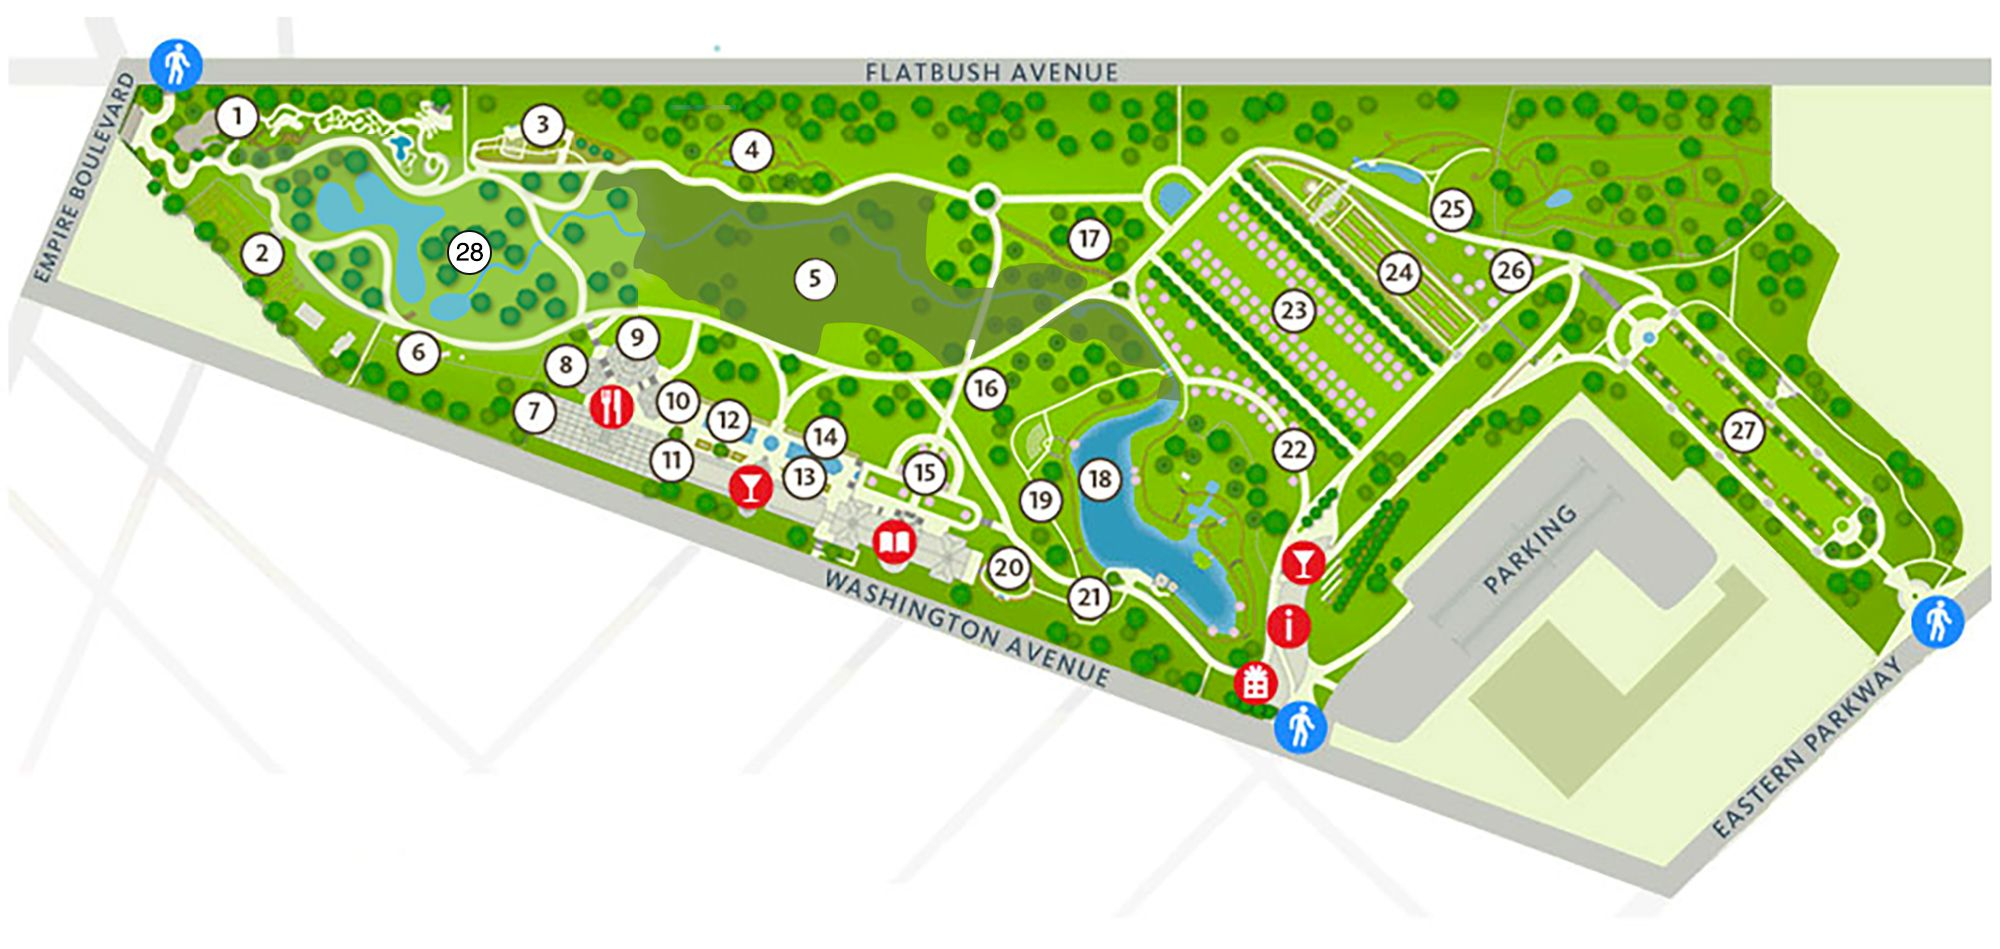 brooklyn botanic garden map Gardens Conservatories Botanical Gardens Garden Nursery brooklyn botanic garden map